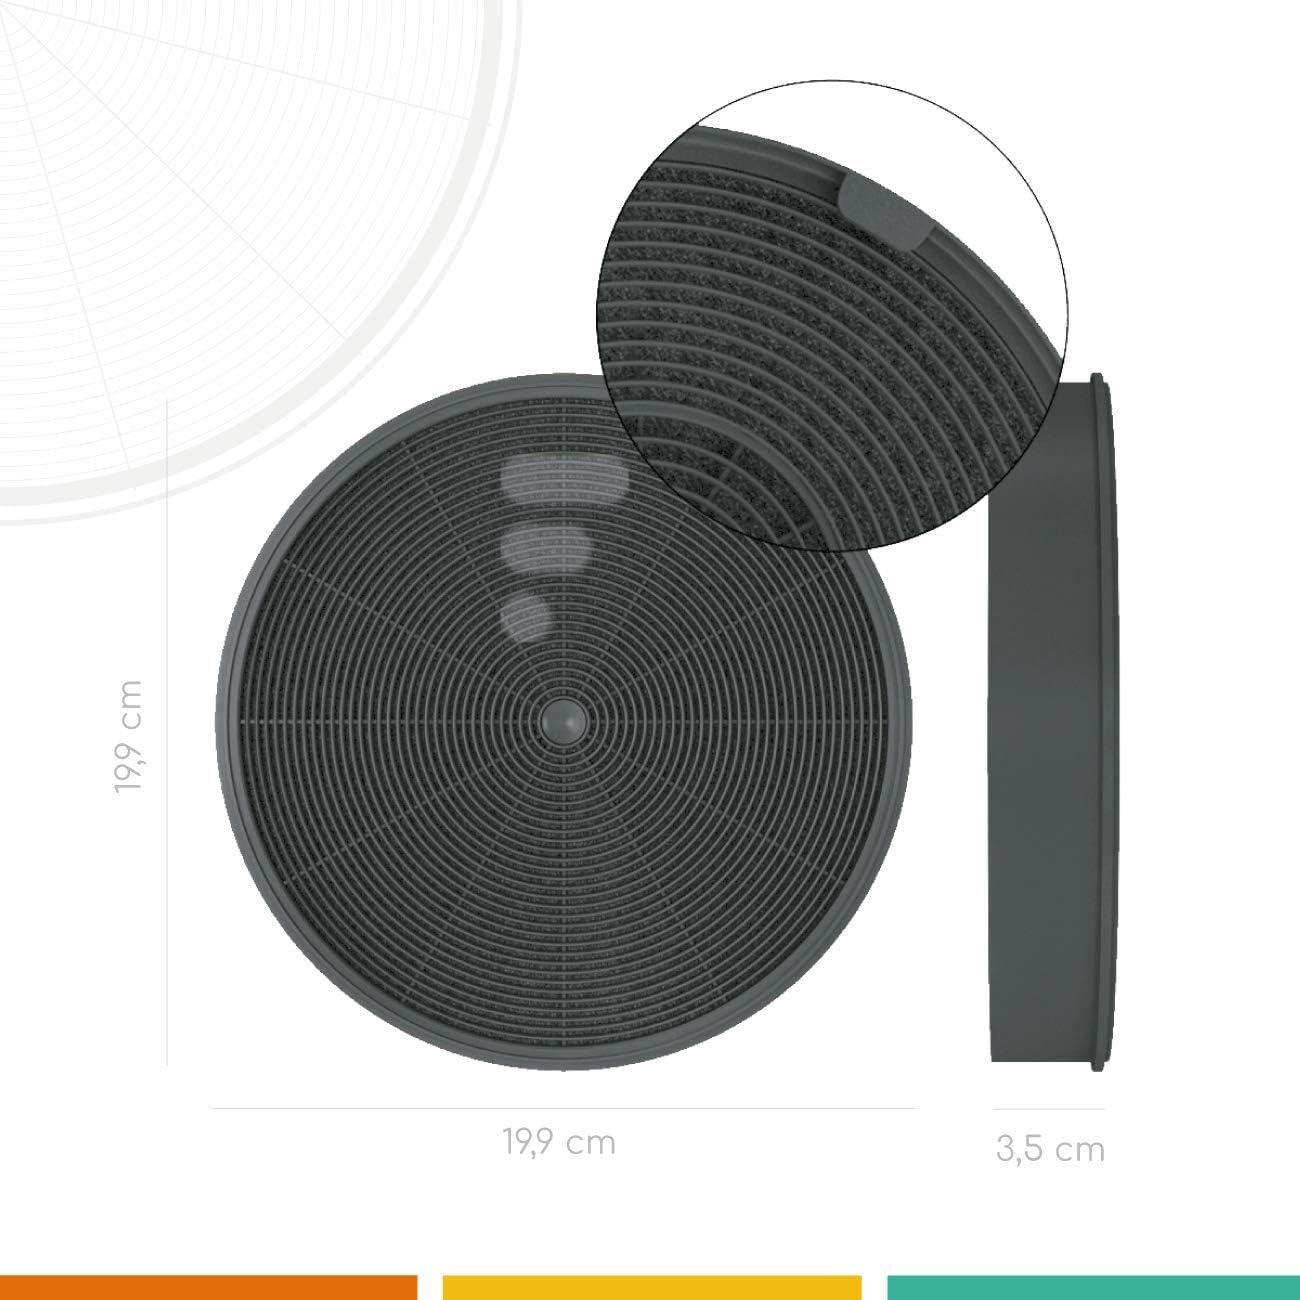 2 filtros de campana extractora FC13, compatibles con Roblin 5403009 Franke 506415 449613 Electrolux EFF76 BOSCH DHZ 5335 FABER Cocktail BOSCH DHZ 5315 De Dietrich AH4066F1 Neff Z5135x1: Amazon.es: Grandes electrodomésticos